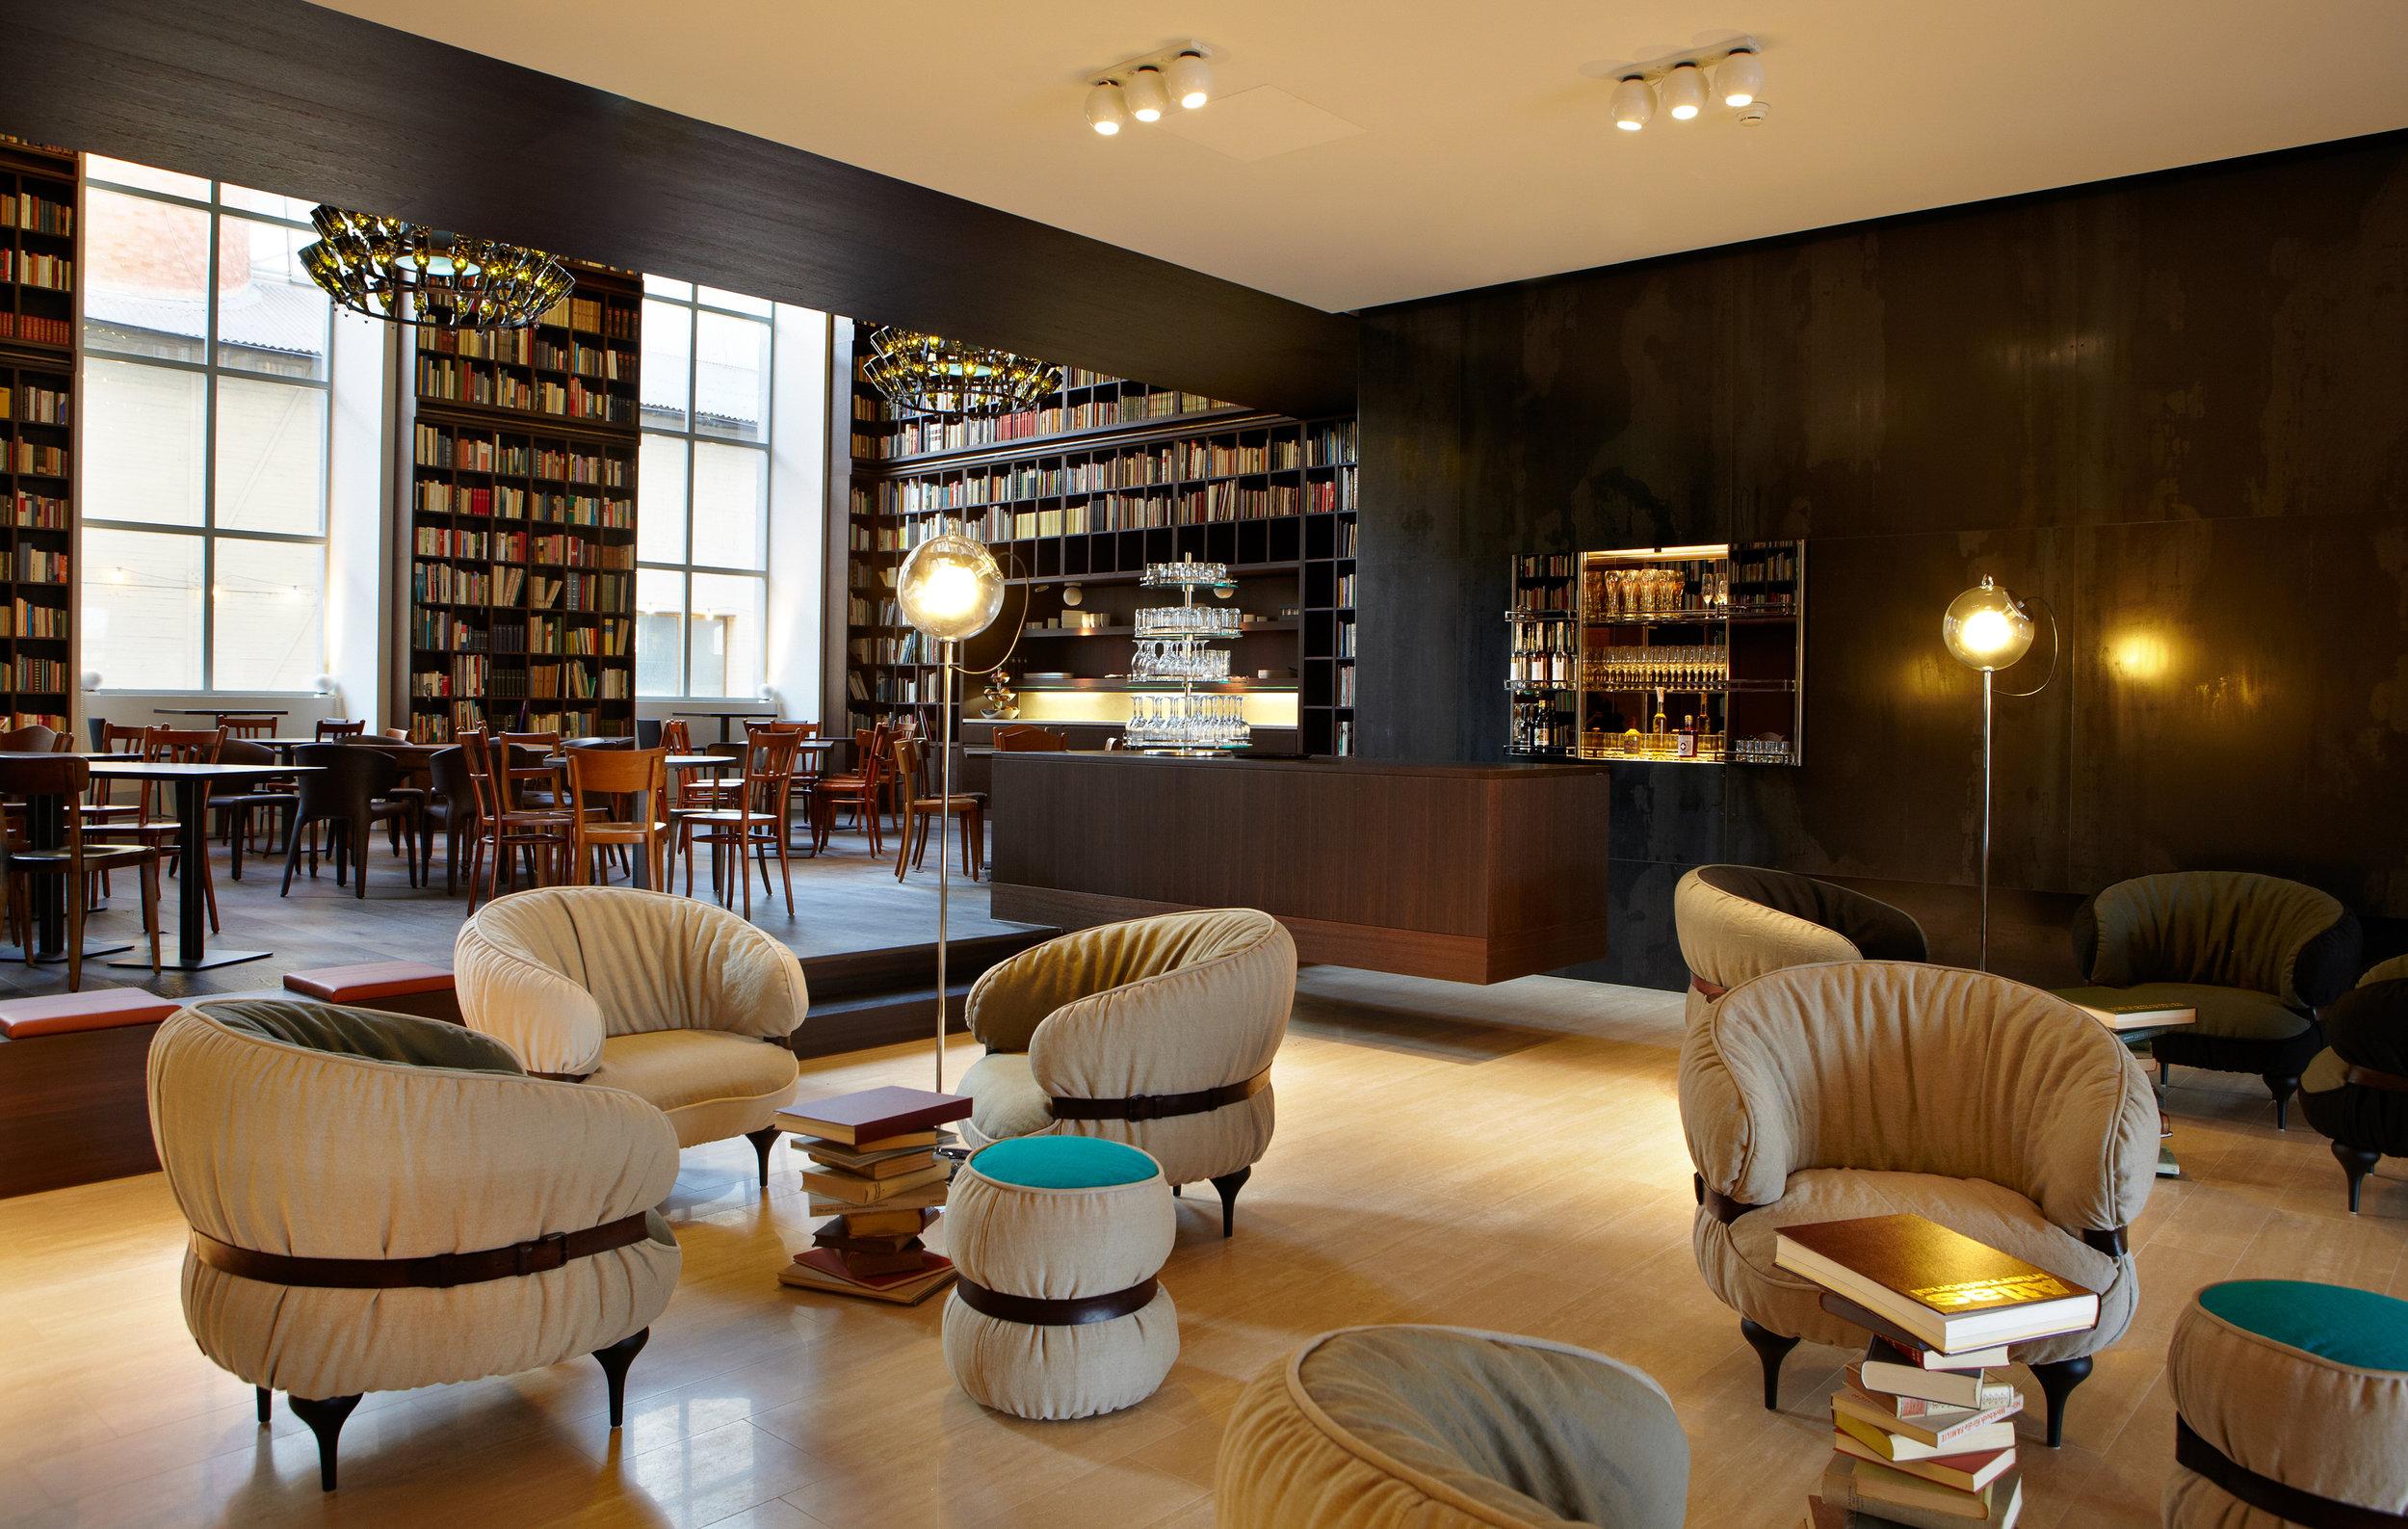 B2 Boutique Hotels + Spa_Lobby Lounge (2).JPG